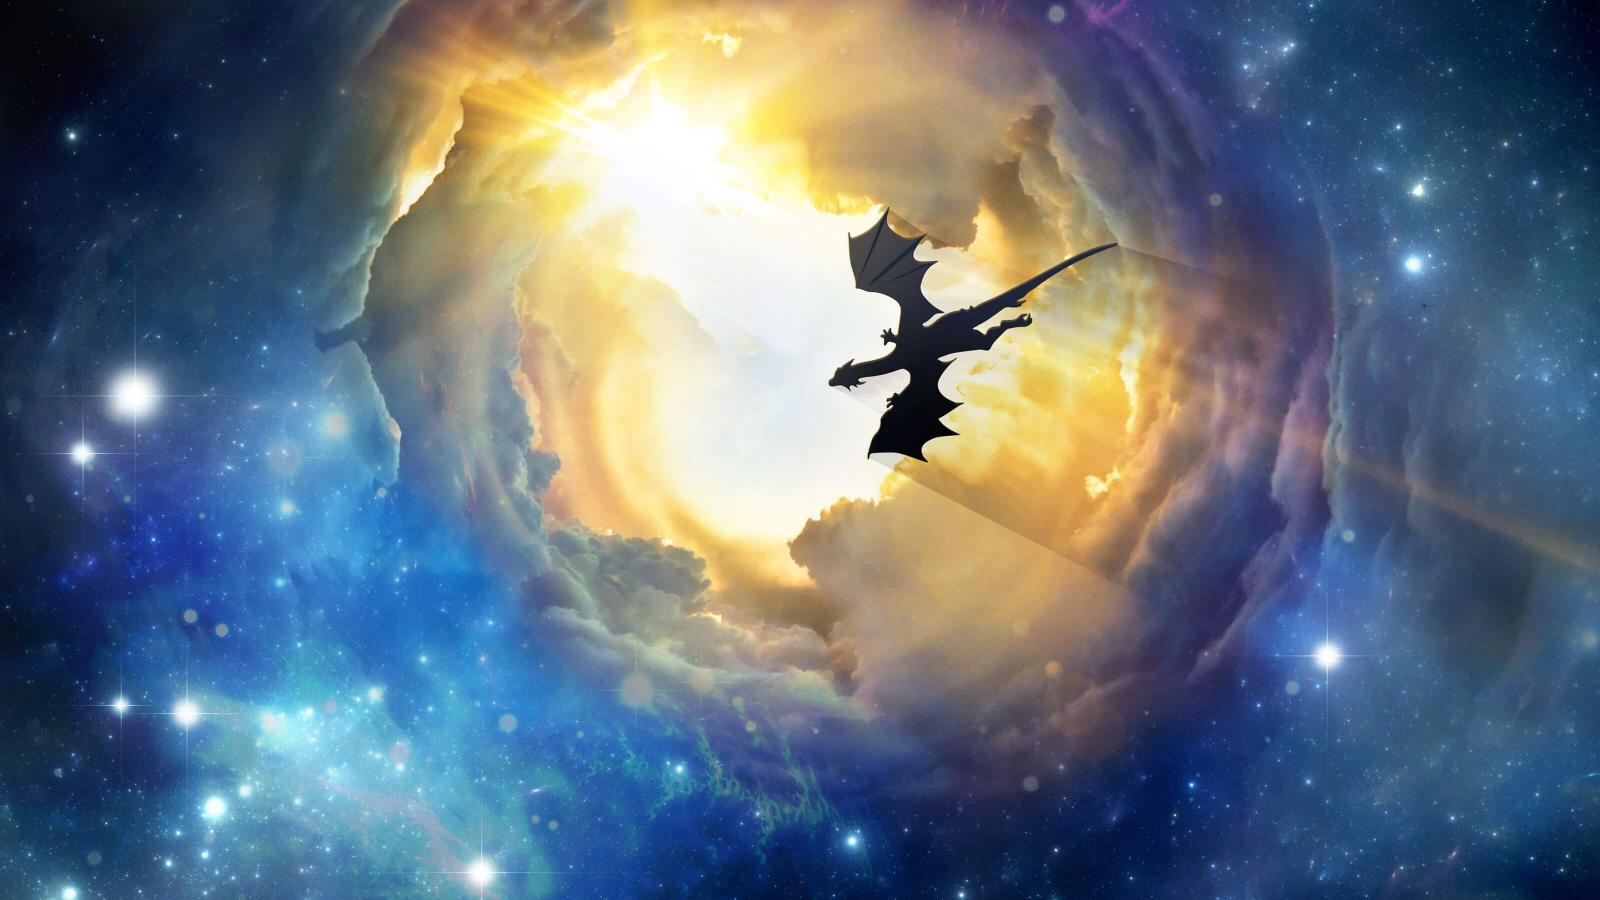 Dragons-Page-Header-1600x900